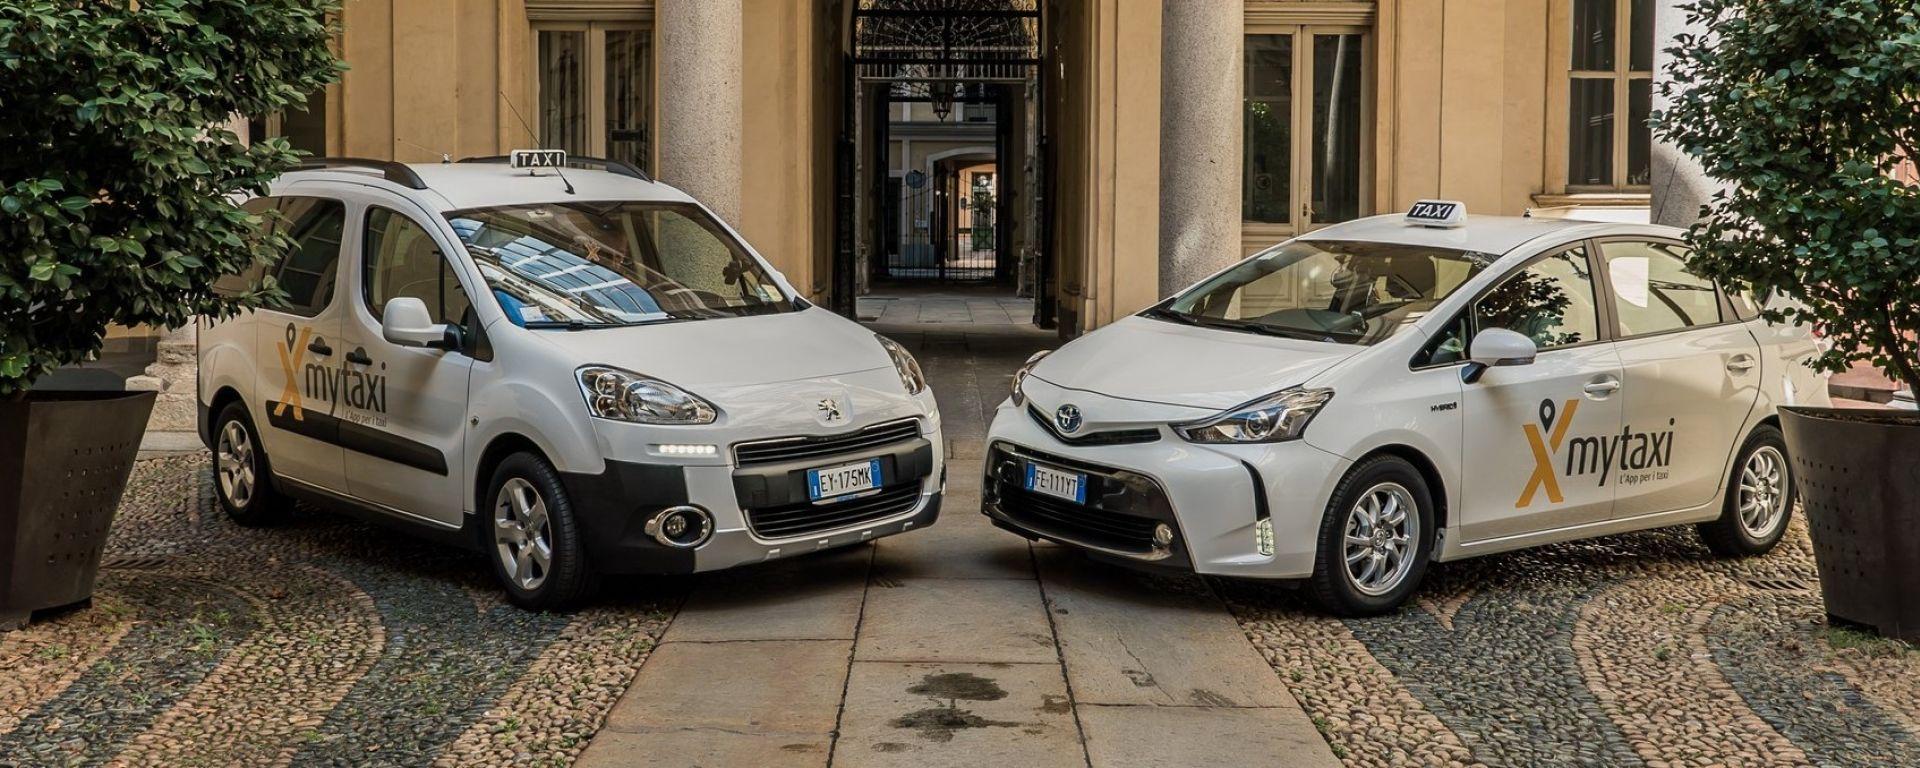 La città di Torino accoglie mytaxi, l'app per i taxi più grande al mondo